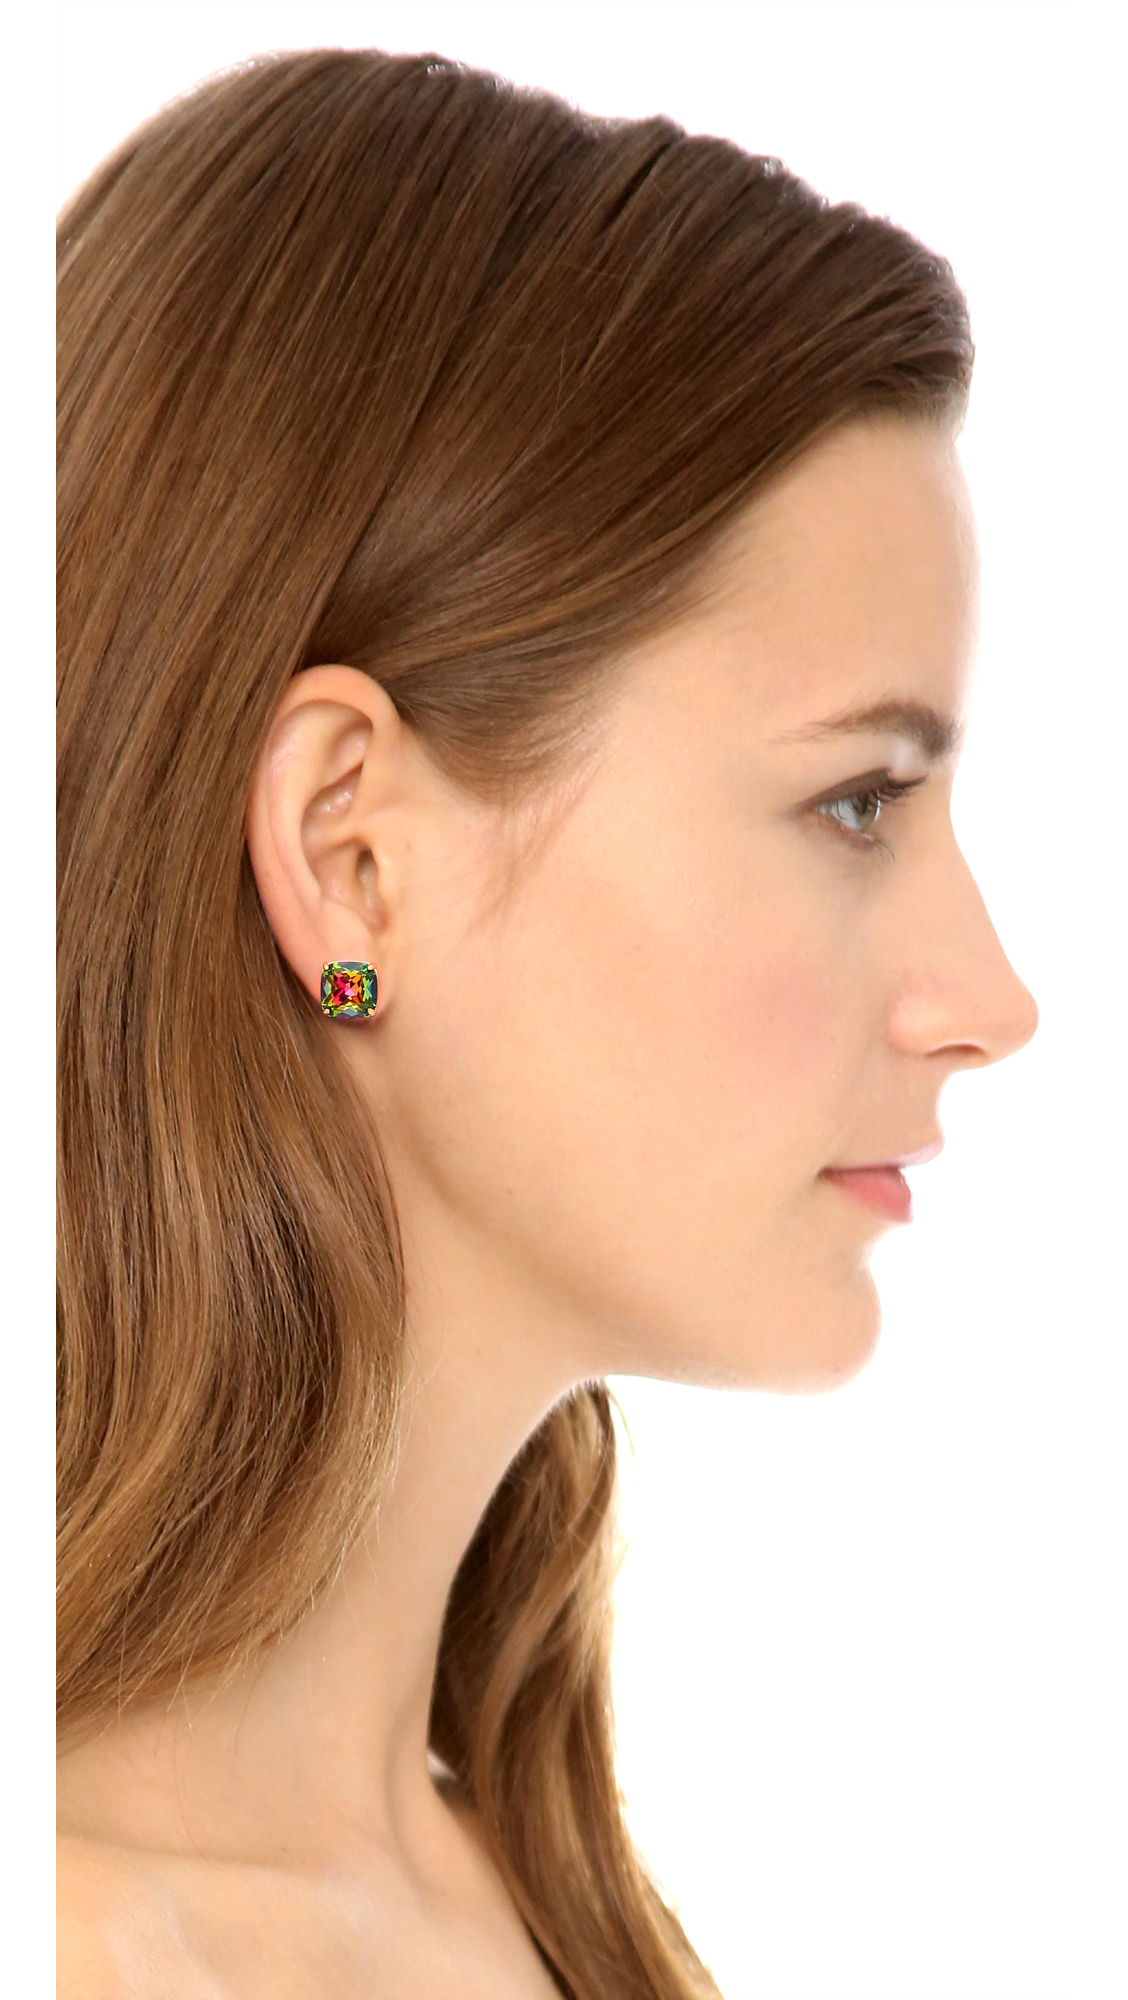 2129e8199 ... Ea Stud Earrings For Daith Multicolor. Kate Spade Glitter Stud Earrings  Amazing Diamond. Gallery. Lyst Kate Spade Small Square Stud Earrings